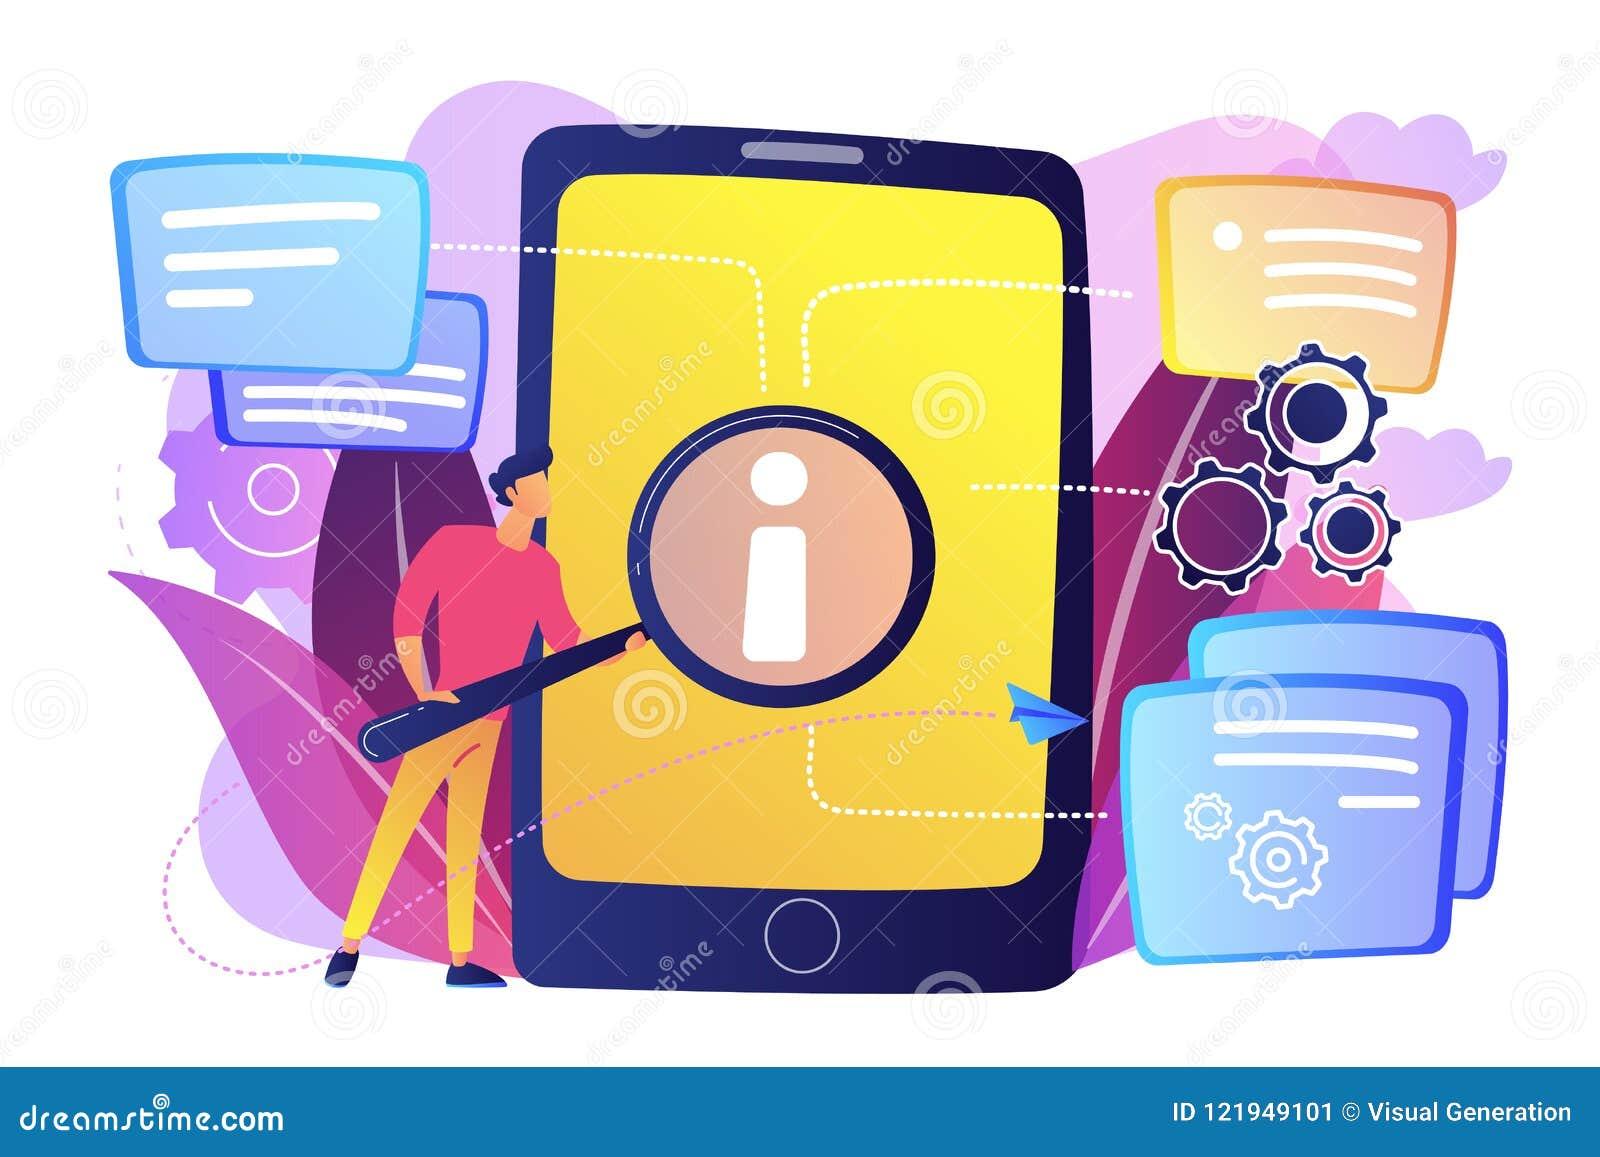 User Guide Concept Vector Illustration. Stock Vector ...